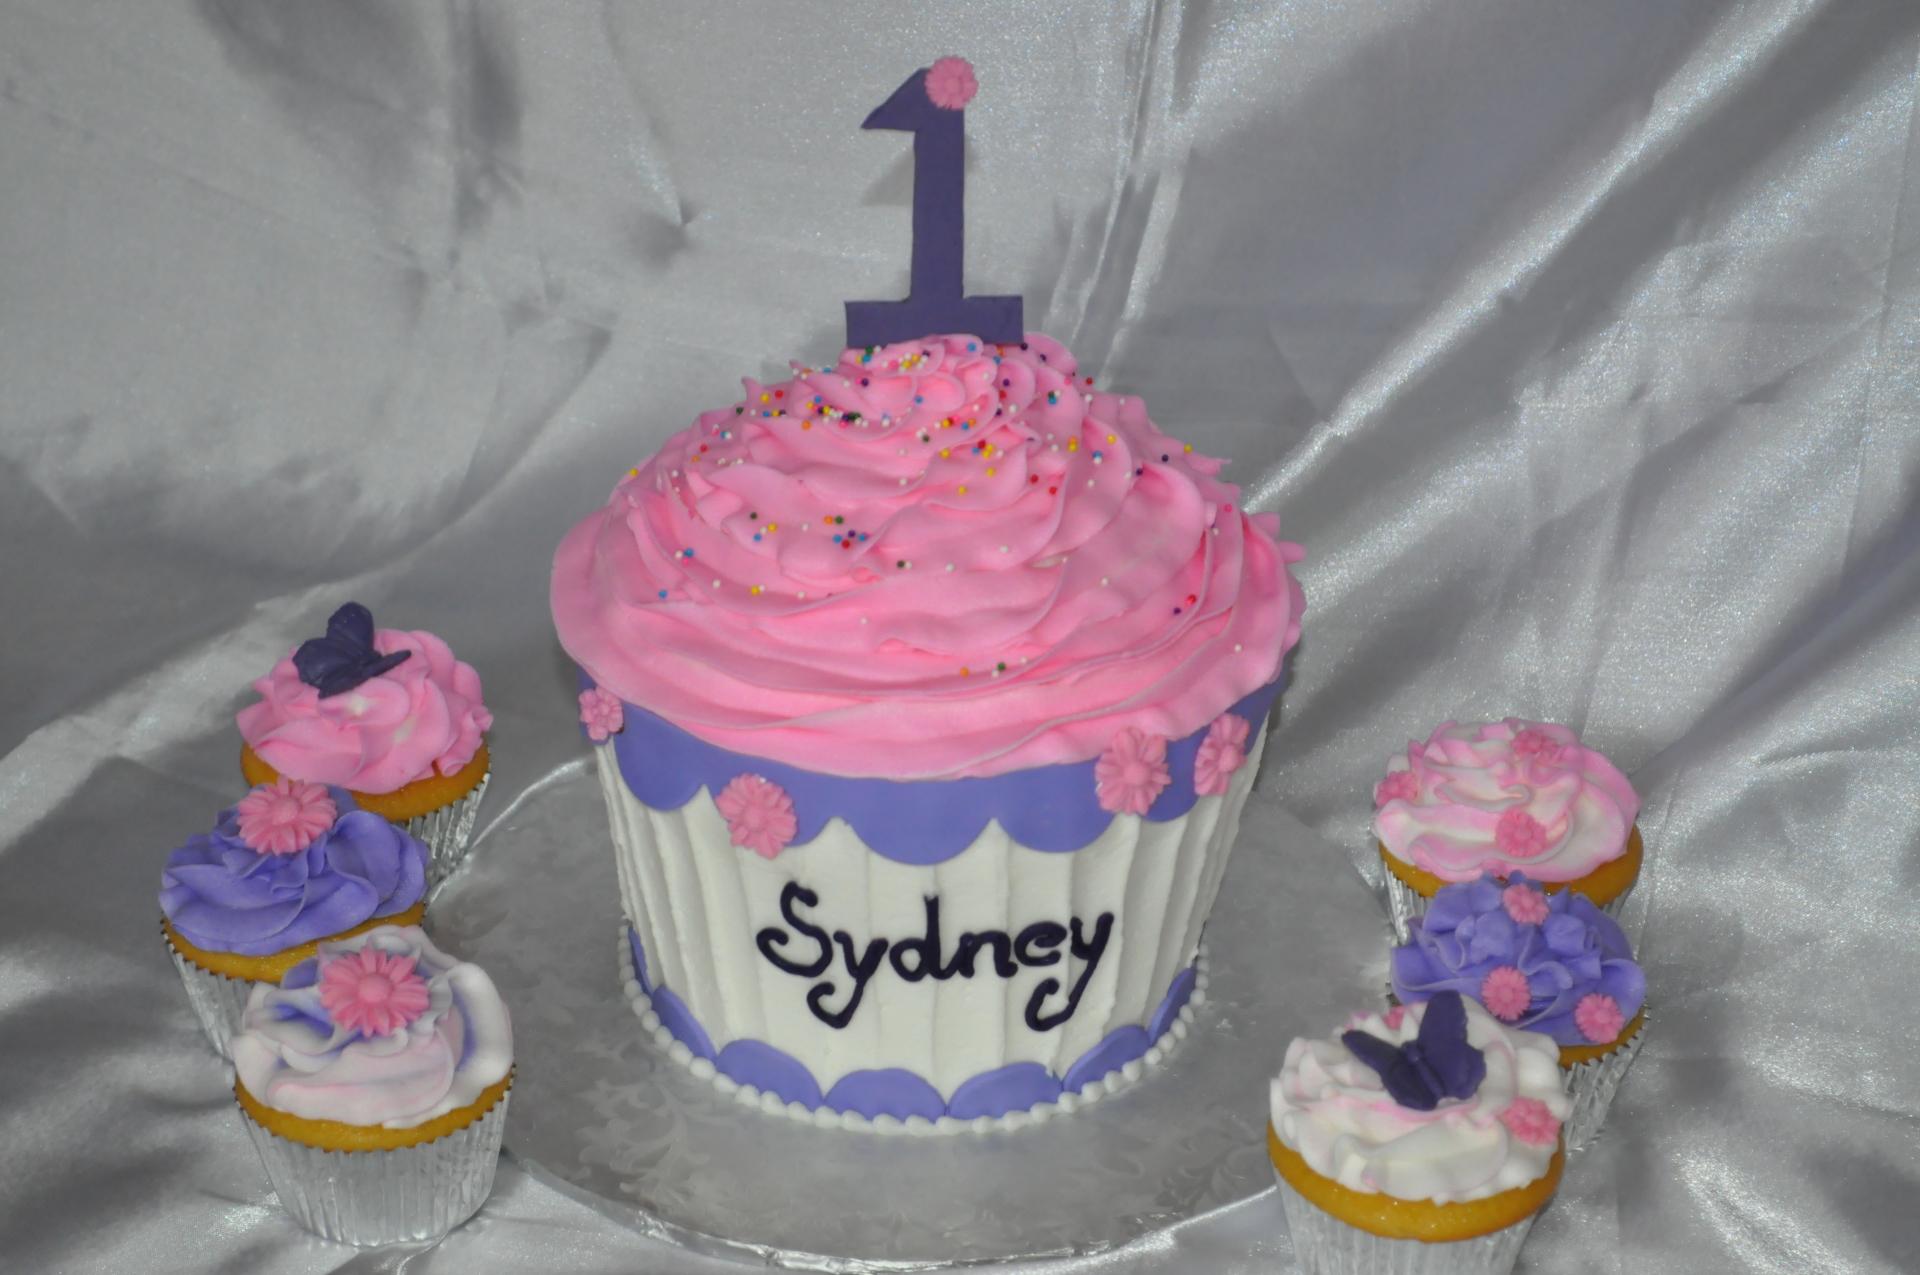 Giant cupcake, Big cupcake cake, 1st birthday cake